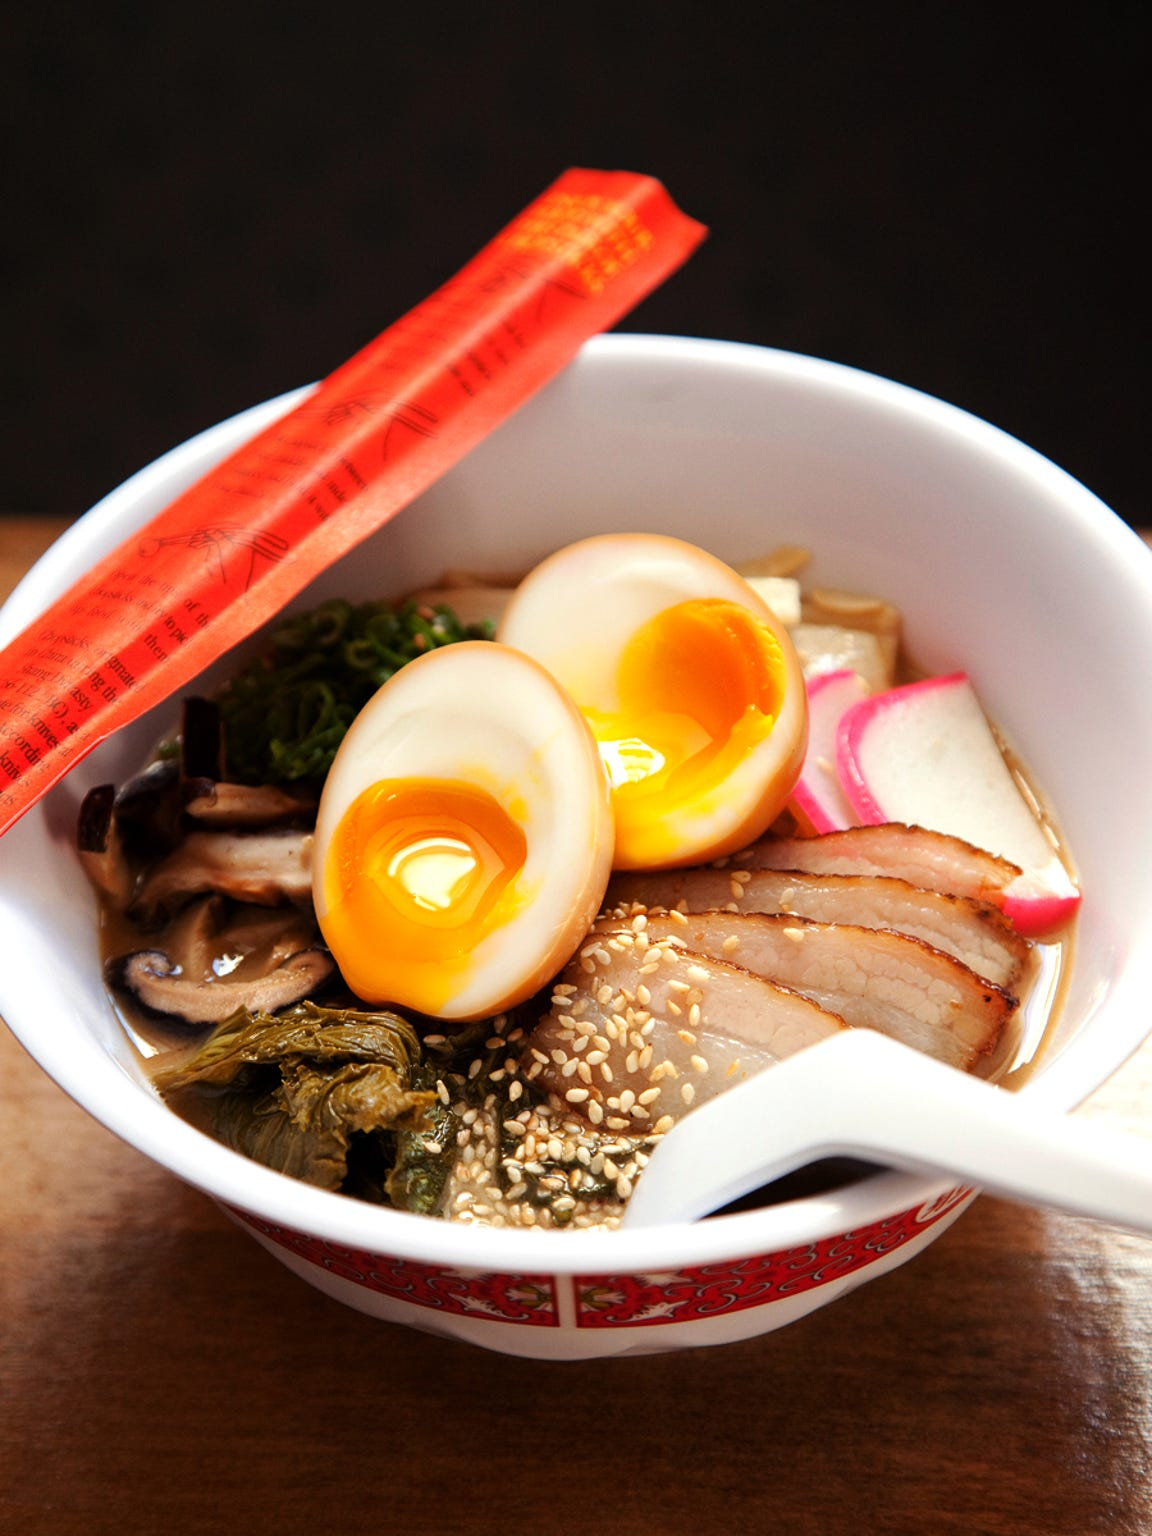 Red Light Ramen is known for its tonkotsu ramen, a